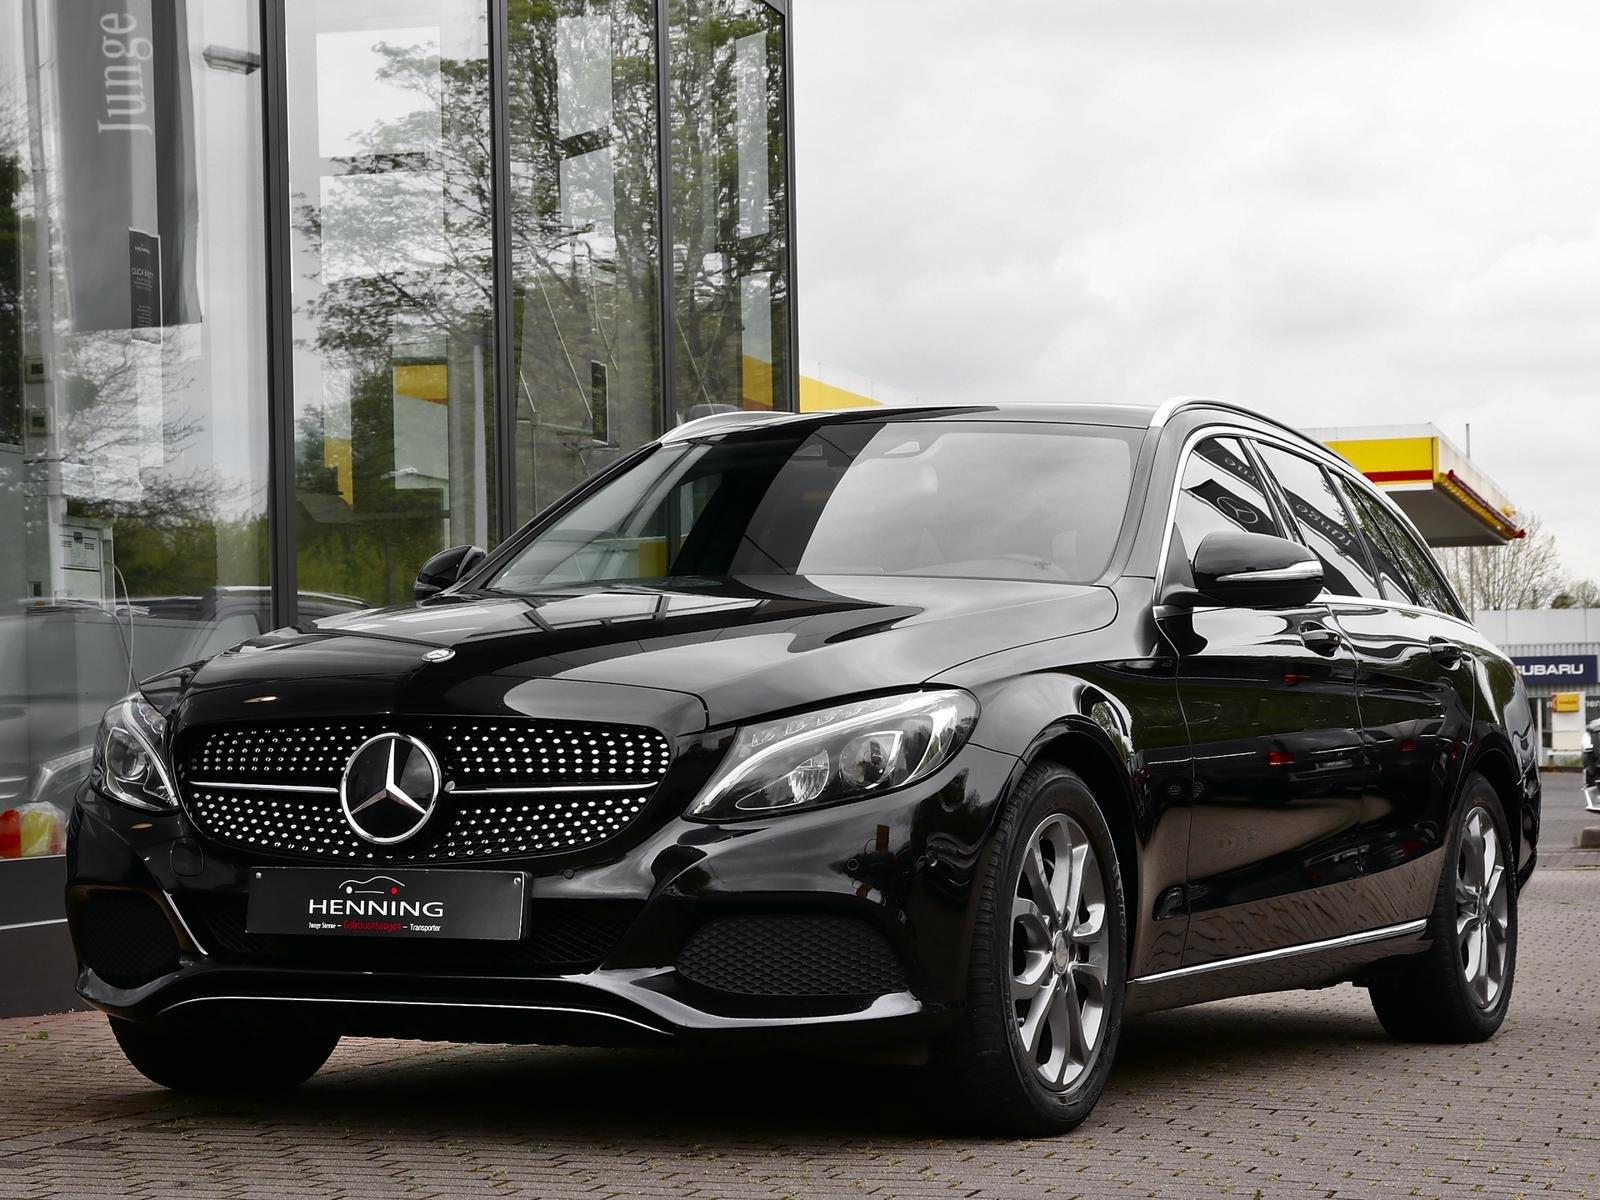 Mercedes-Benz C 250 T Avantgarde 7G Distronic+ Standhzg Comand, Jahr 2015, Diesel